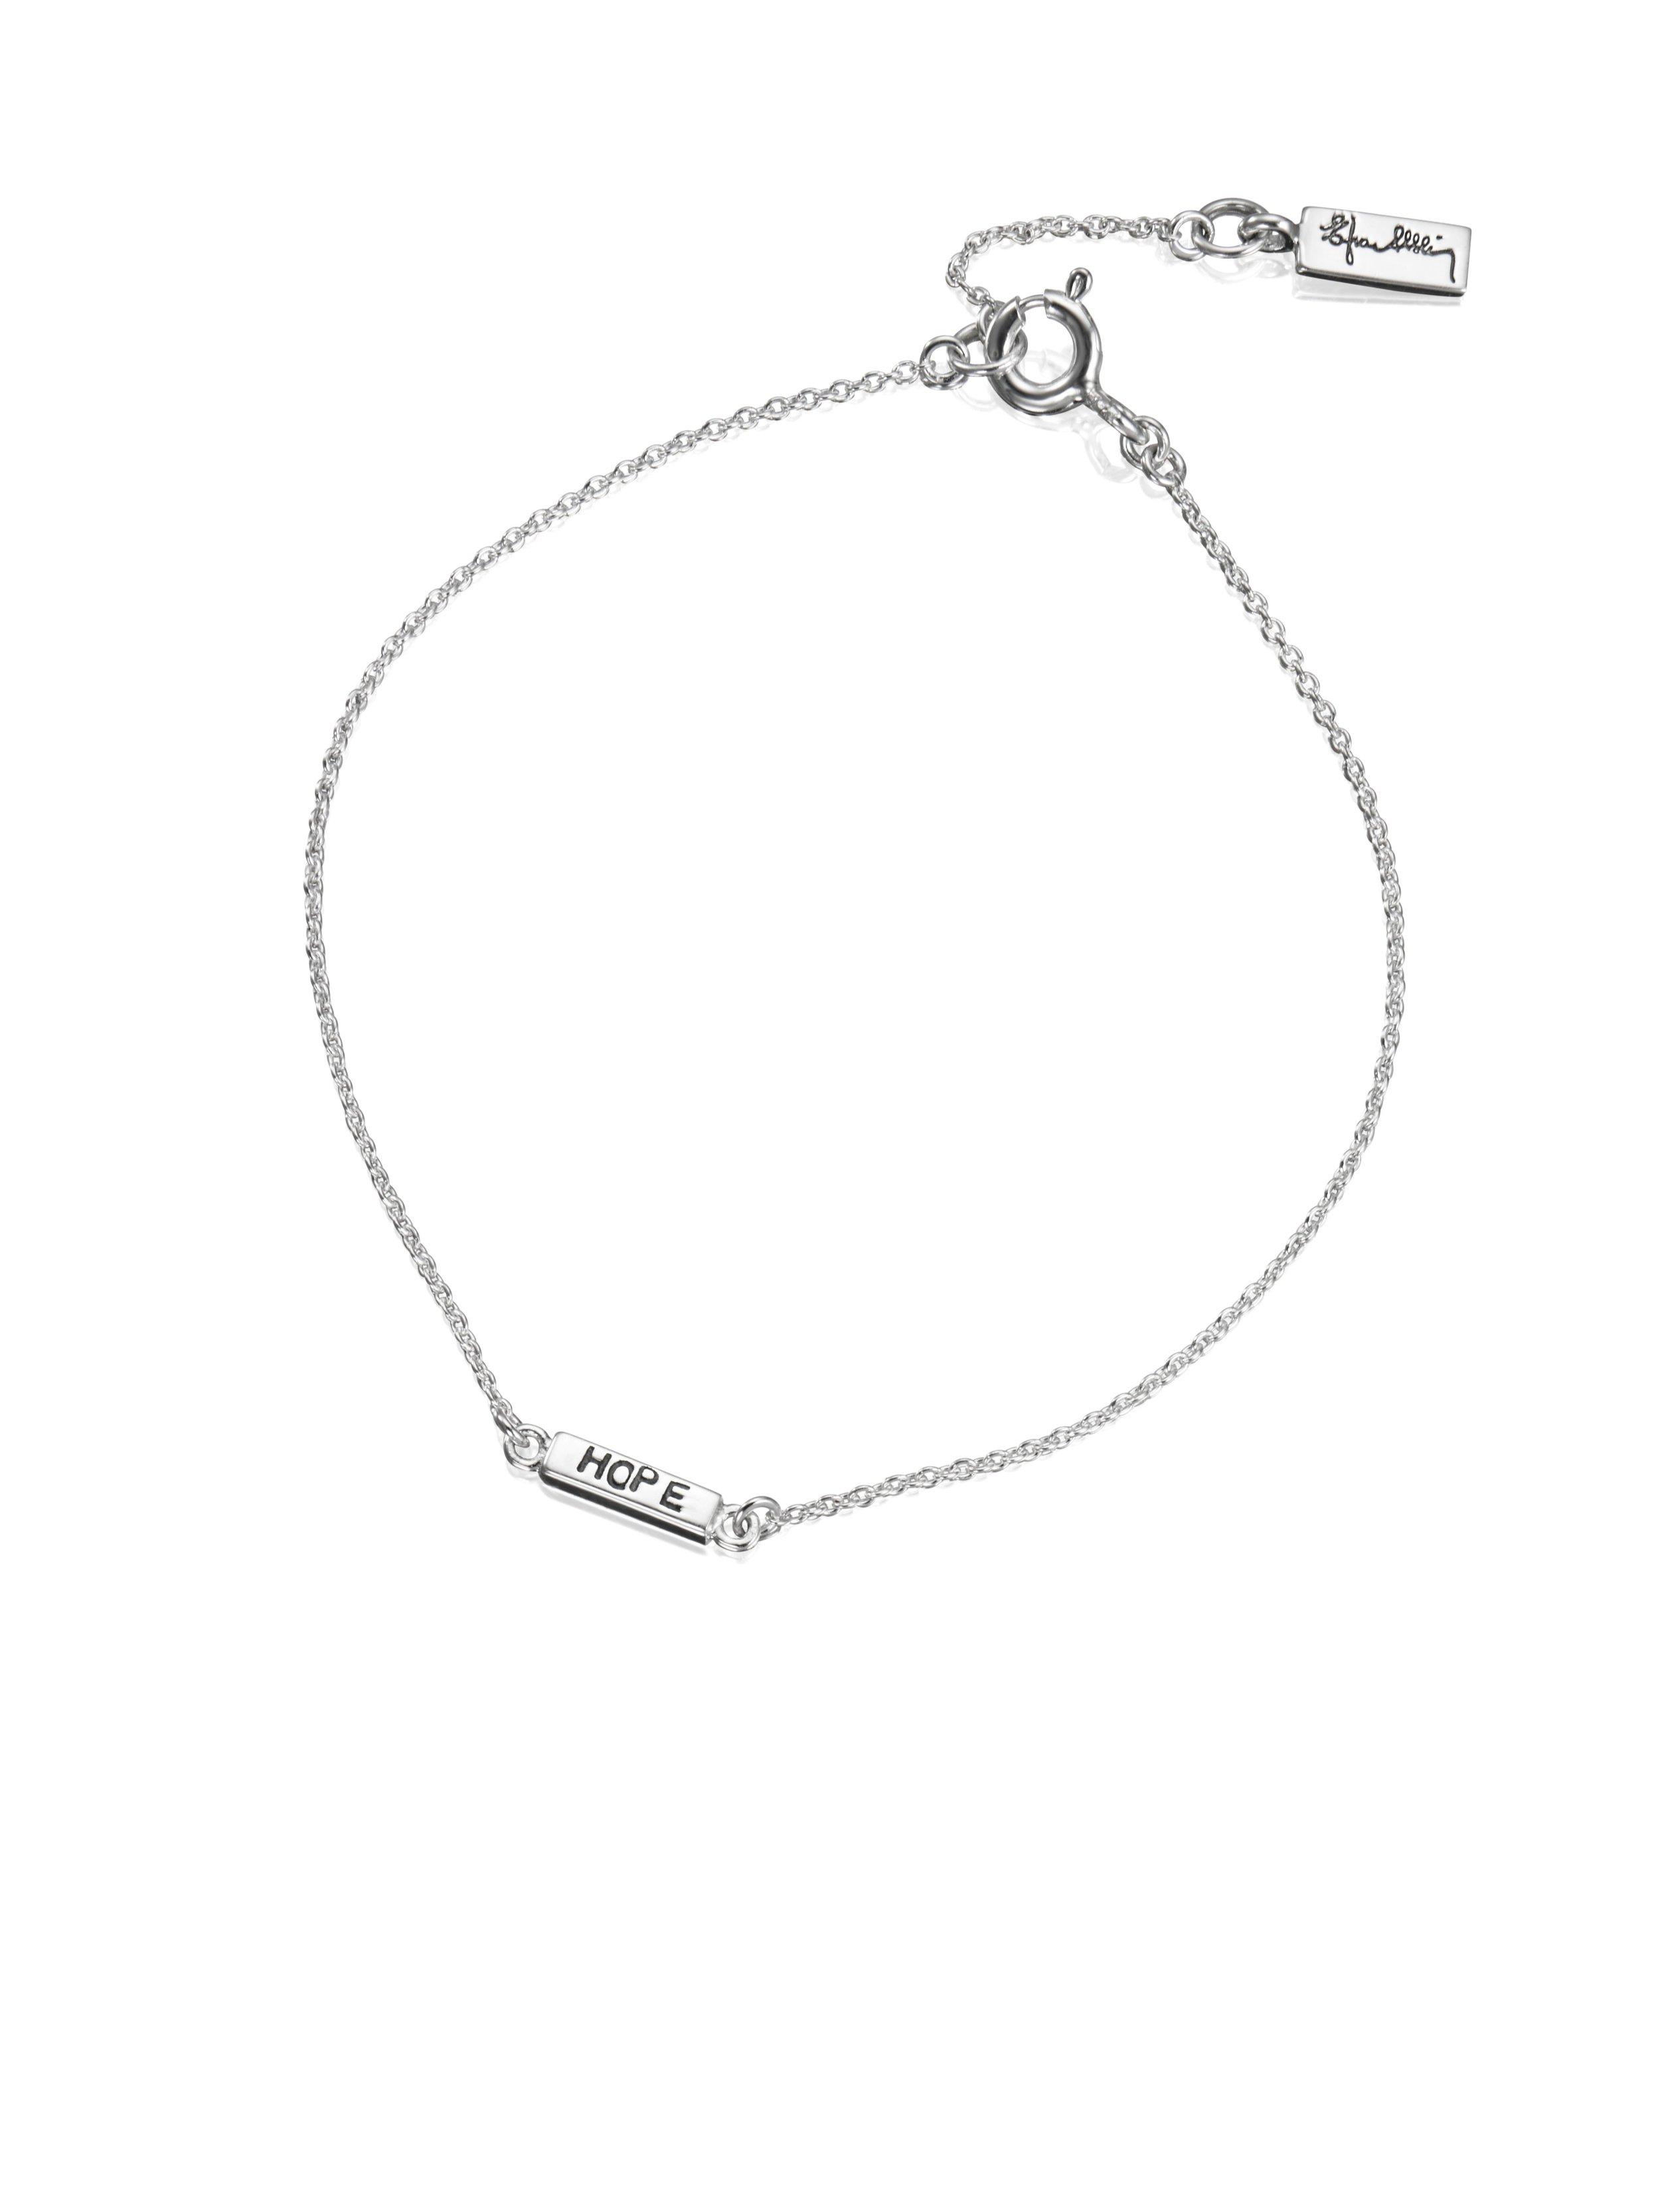 Mini Me Hope Bracelet 14-100-01279(2).jpg